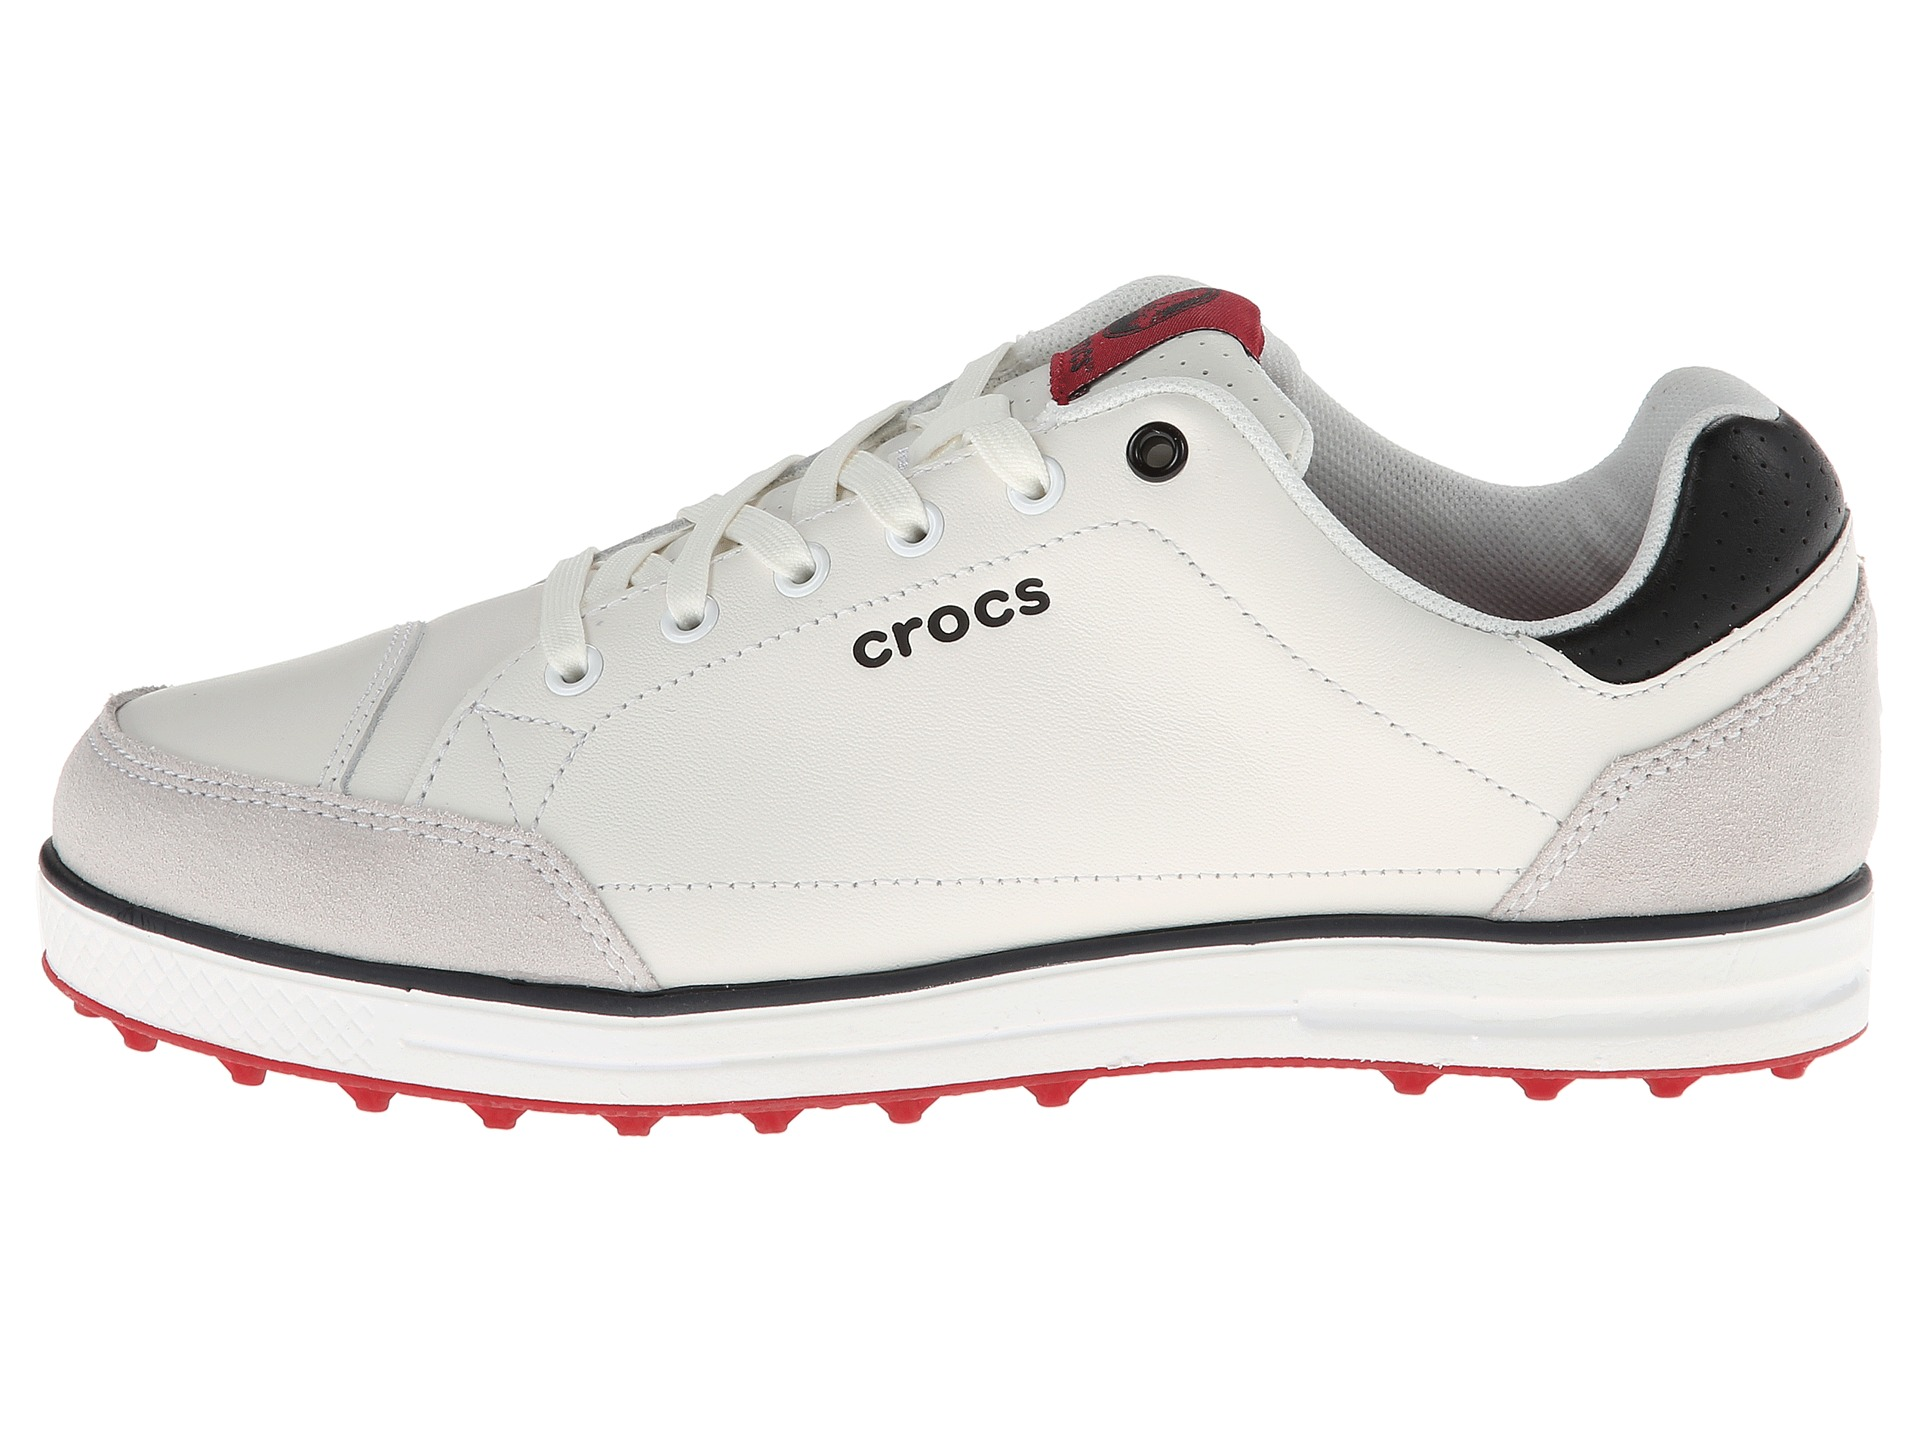 Hank Haney Golf Shoes